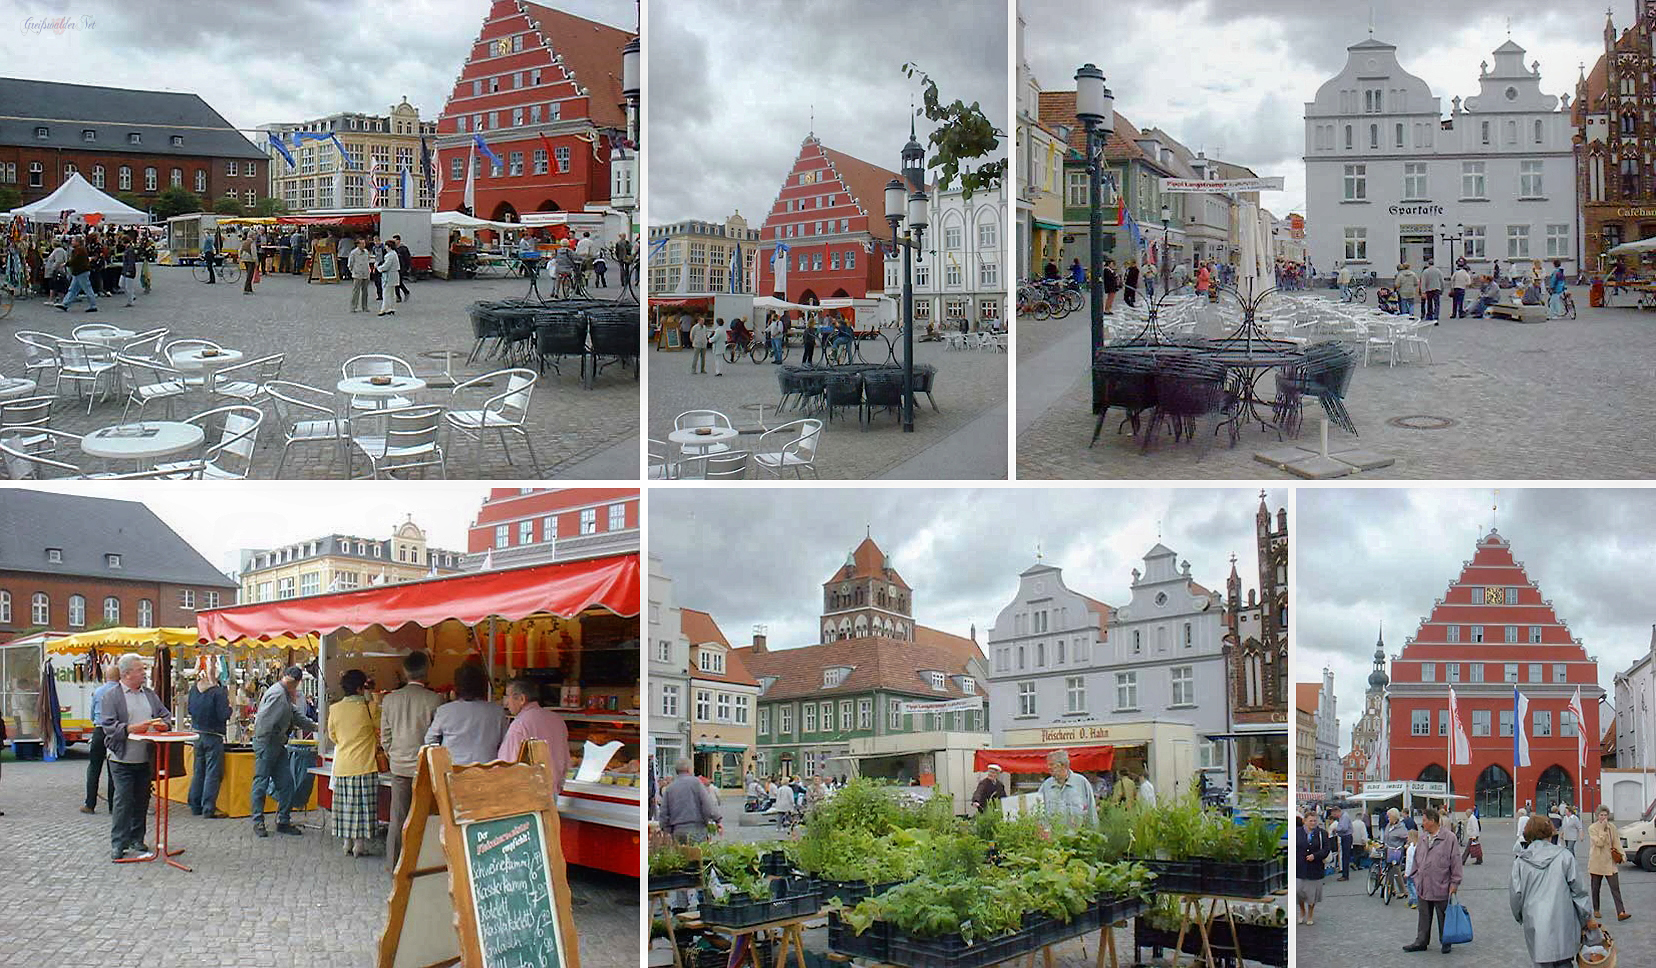 Marktplatz Greifswald im Monat Juli 2000